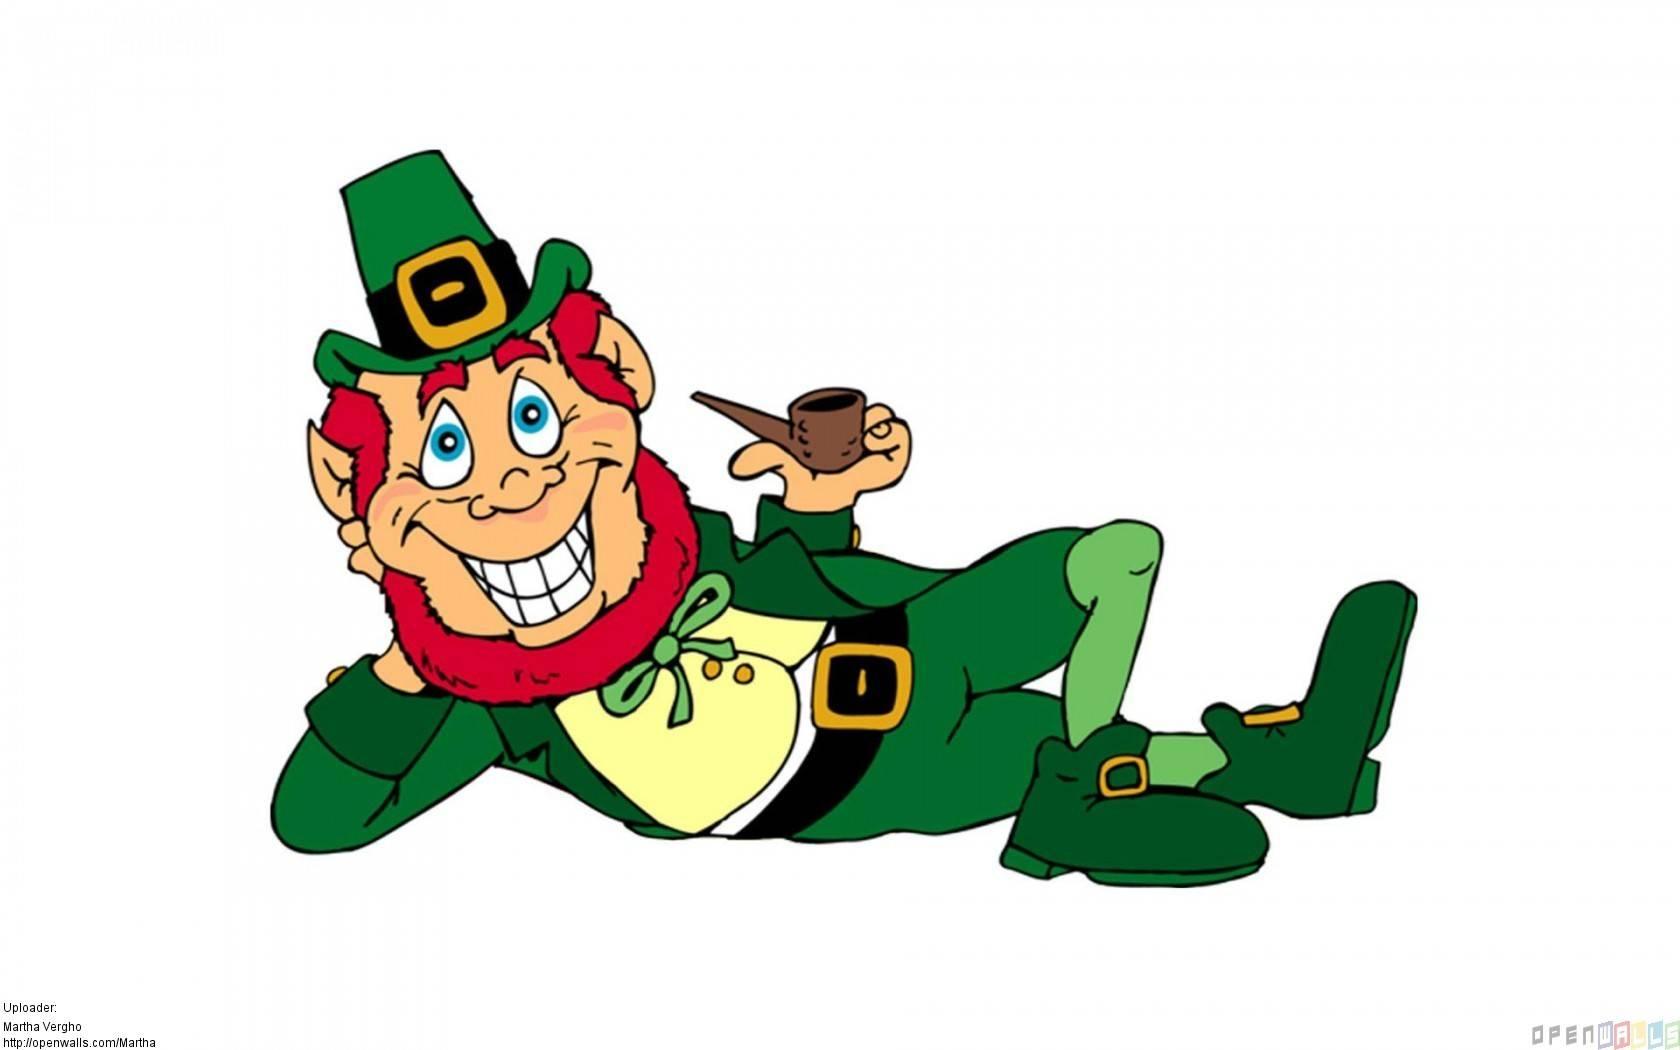 irish leprechaun clipart clipart suggest St. Patrick Clip Art Animated St Patrick's Day Animated Dancers